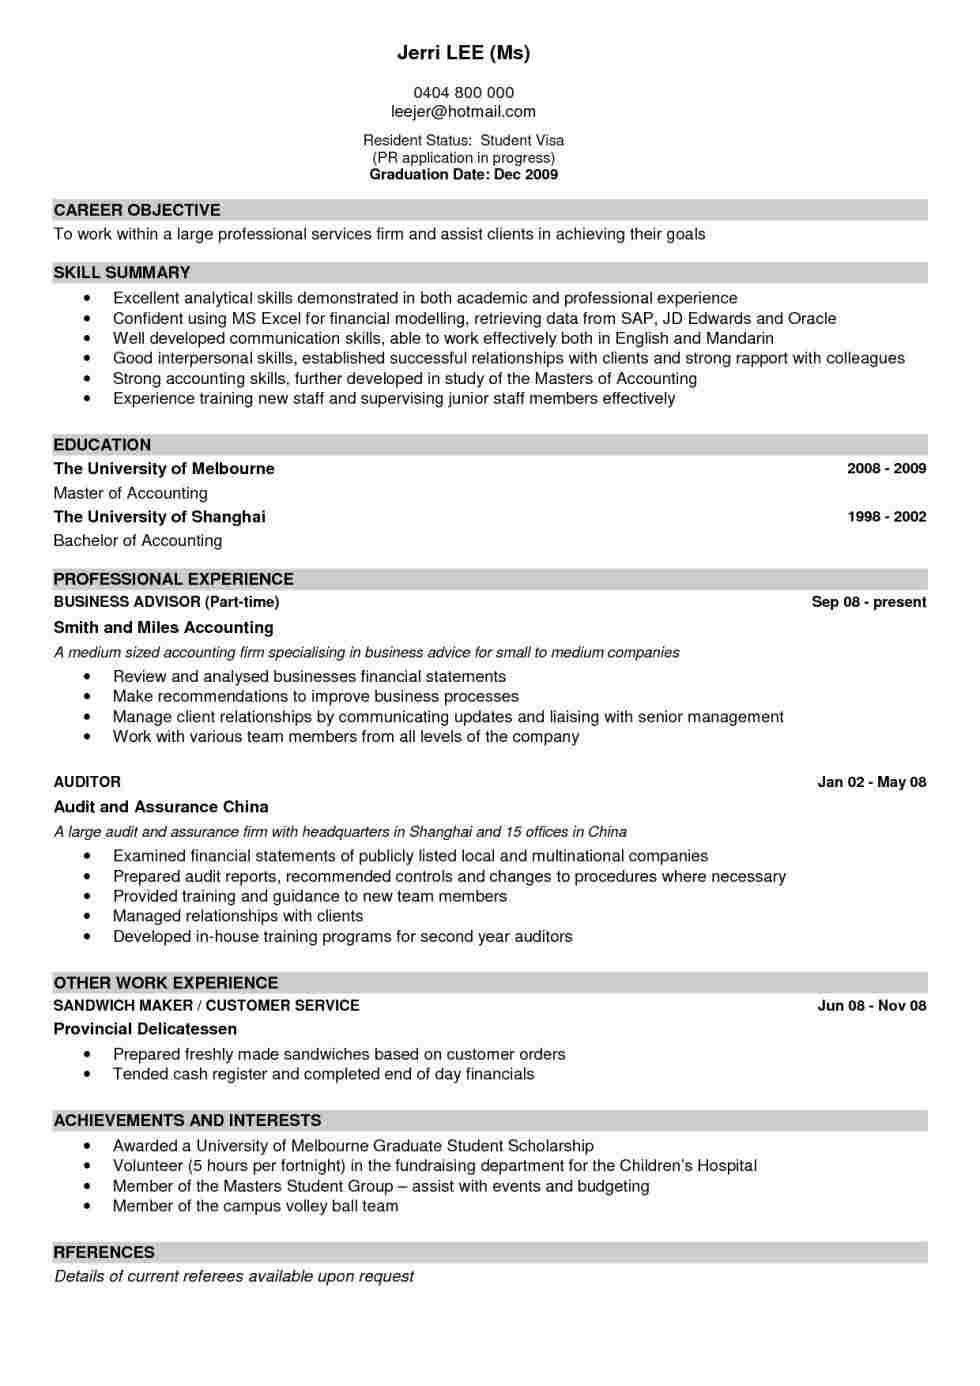 U Of T Resume Examples Resume Templates Good Cv Resume Examples Good Resume Examples